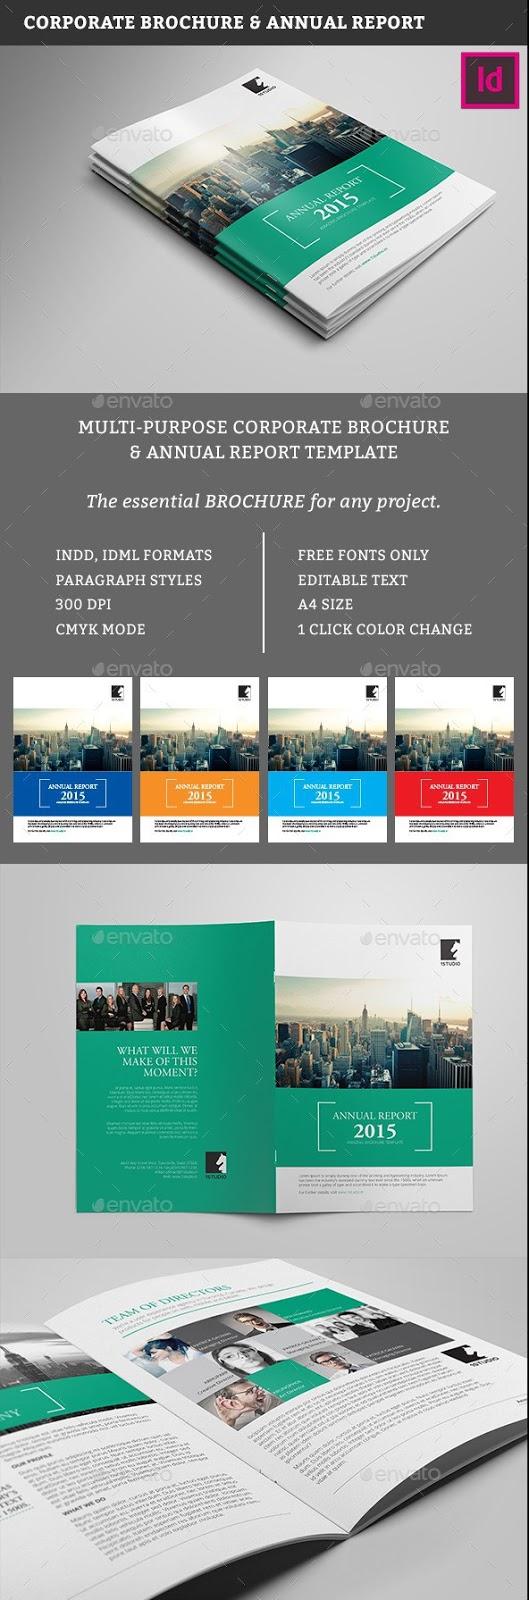 100+ Free & Premium Brochure Templates Photoshop PSD InDesign & AI ...